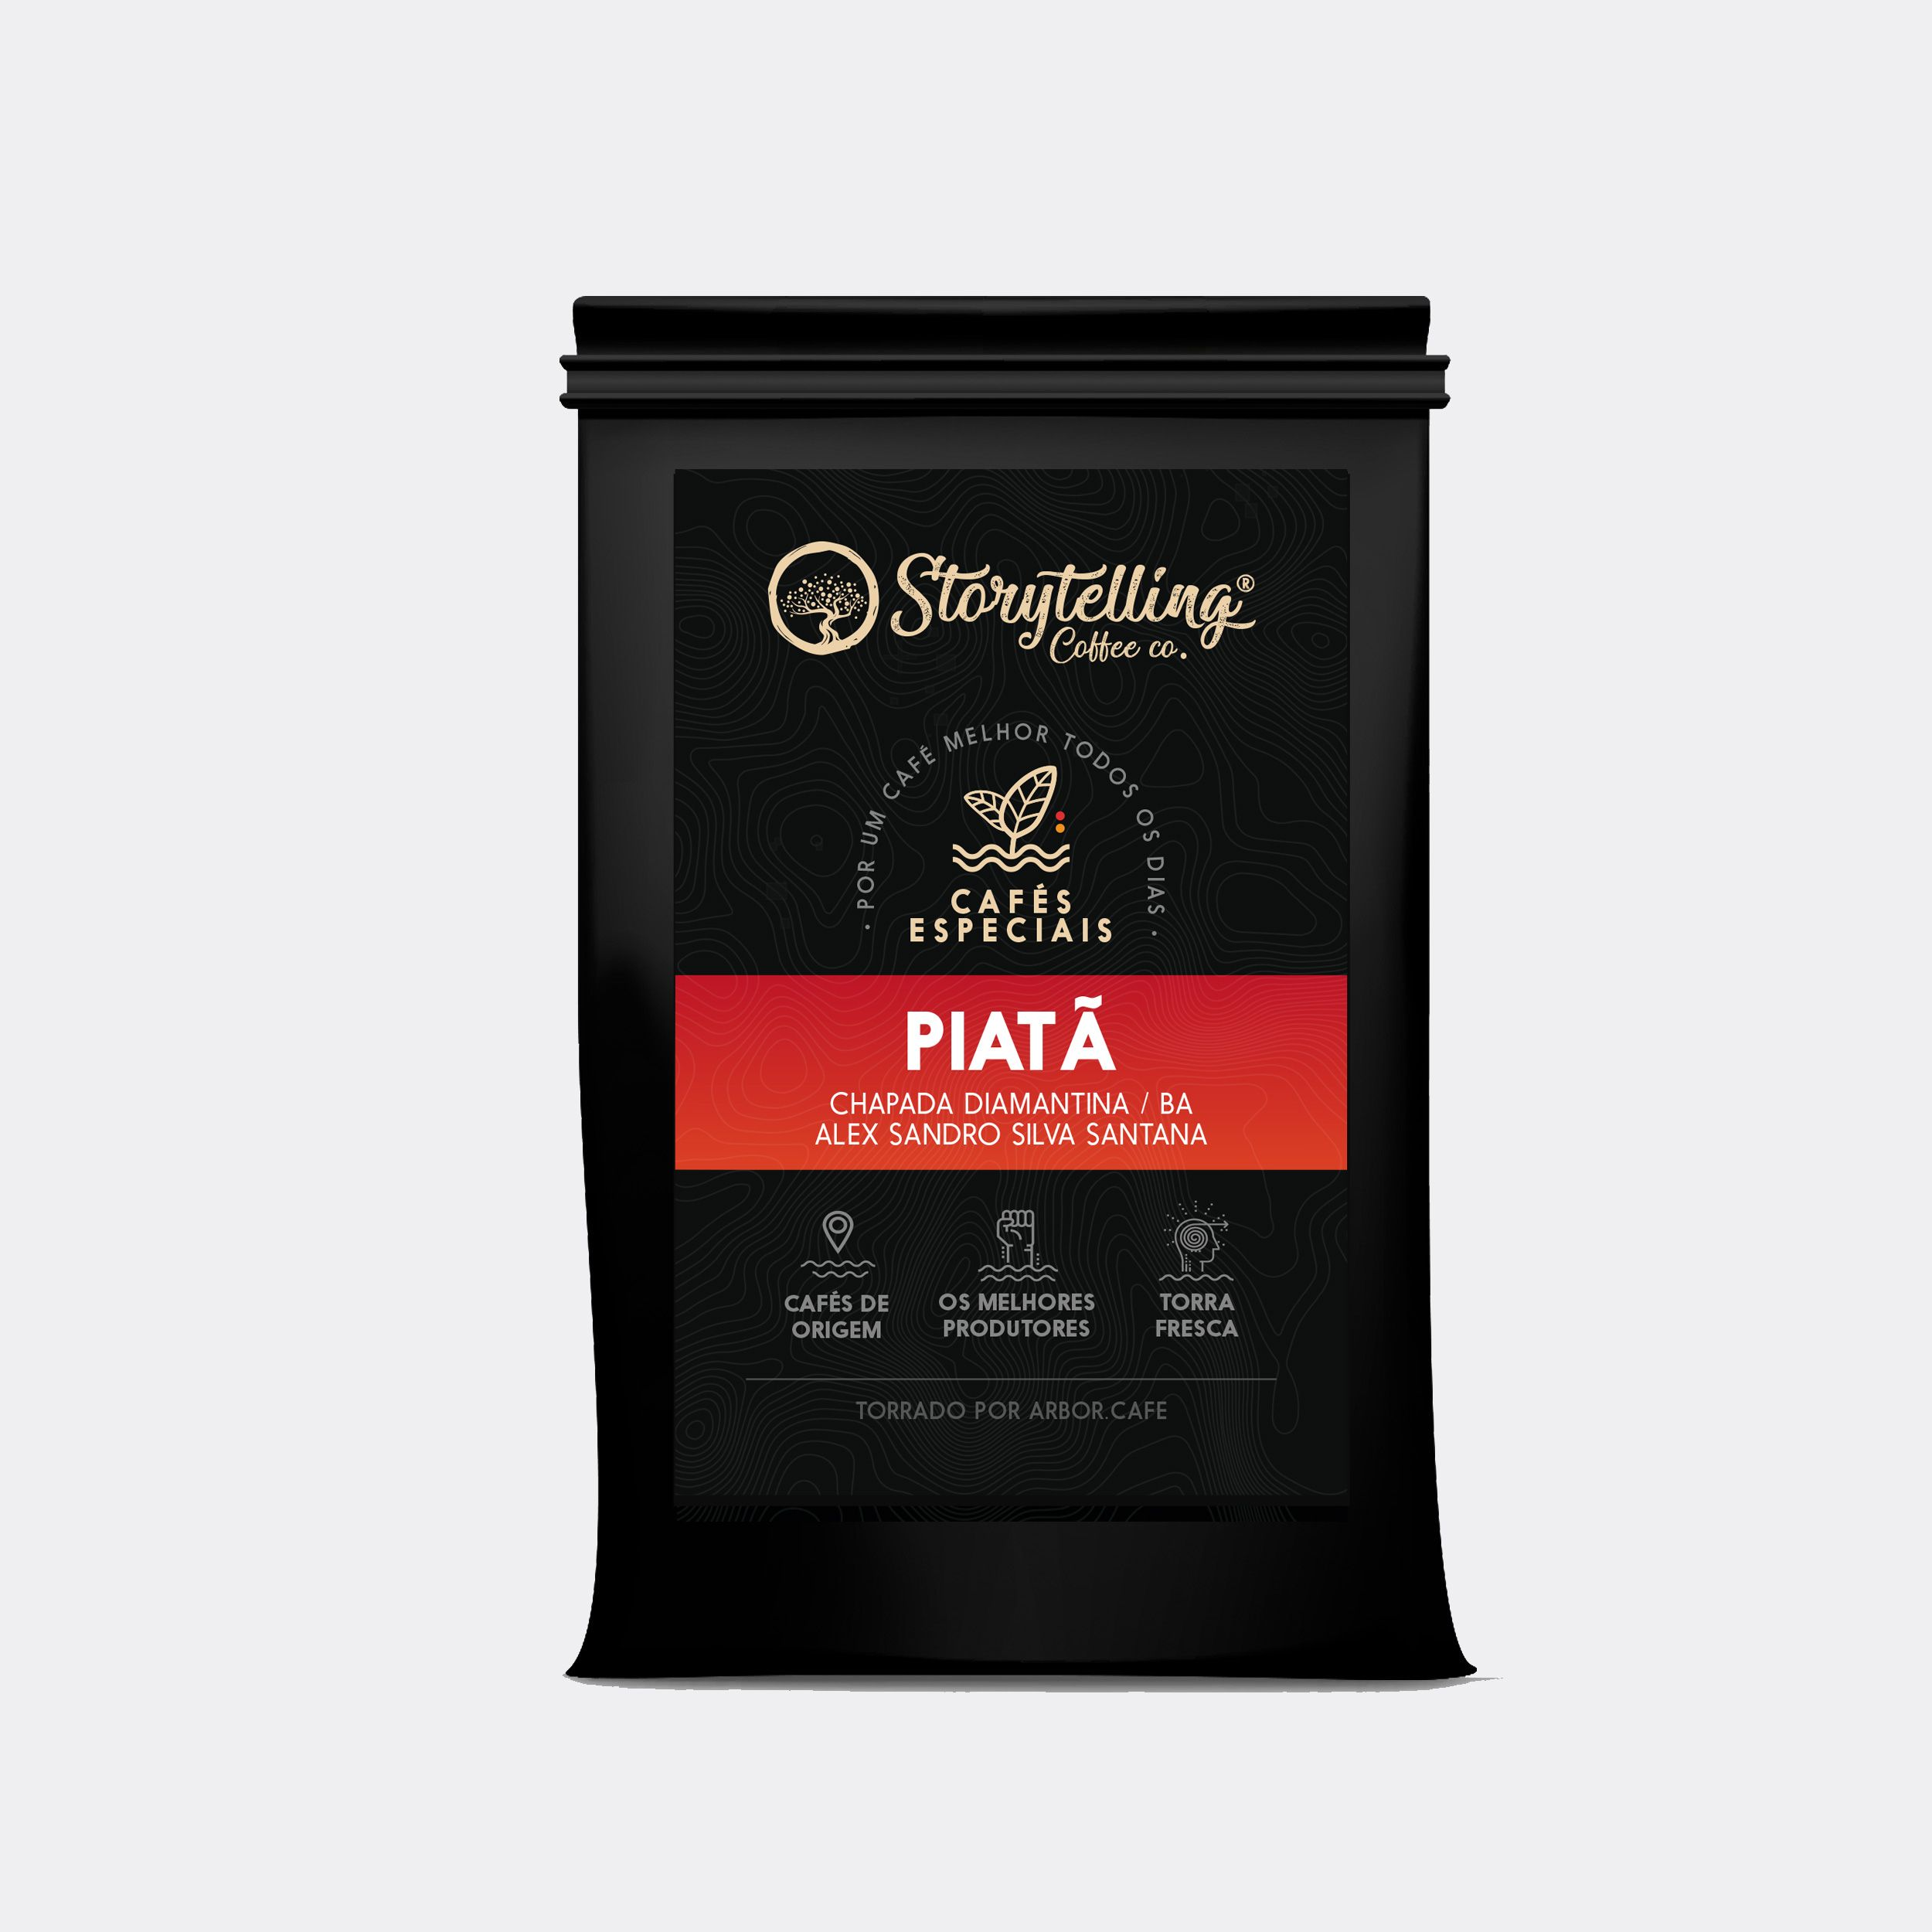 Café Especial Piatã - Storytelling Coffee